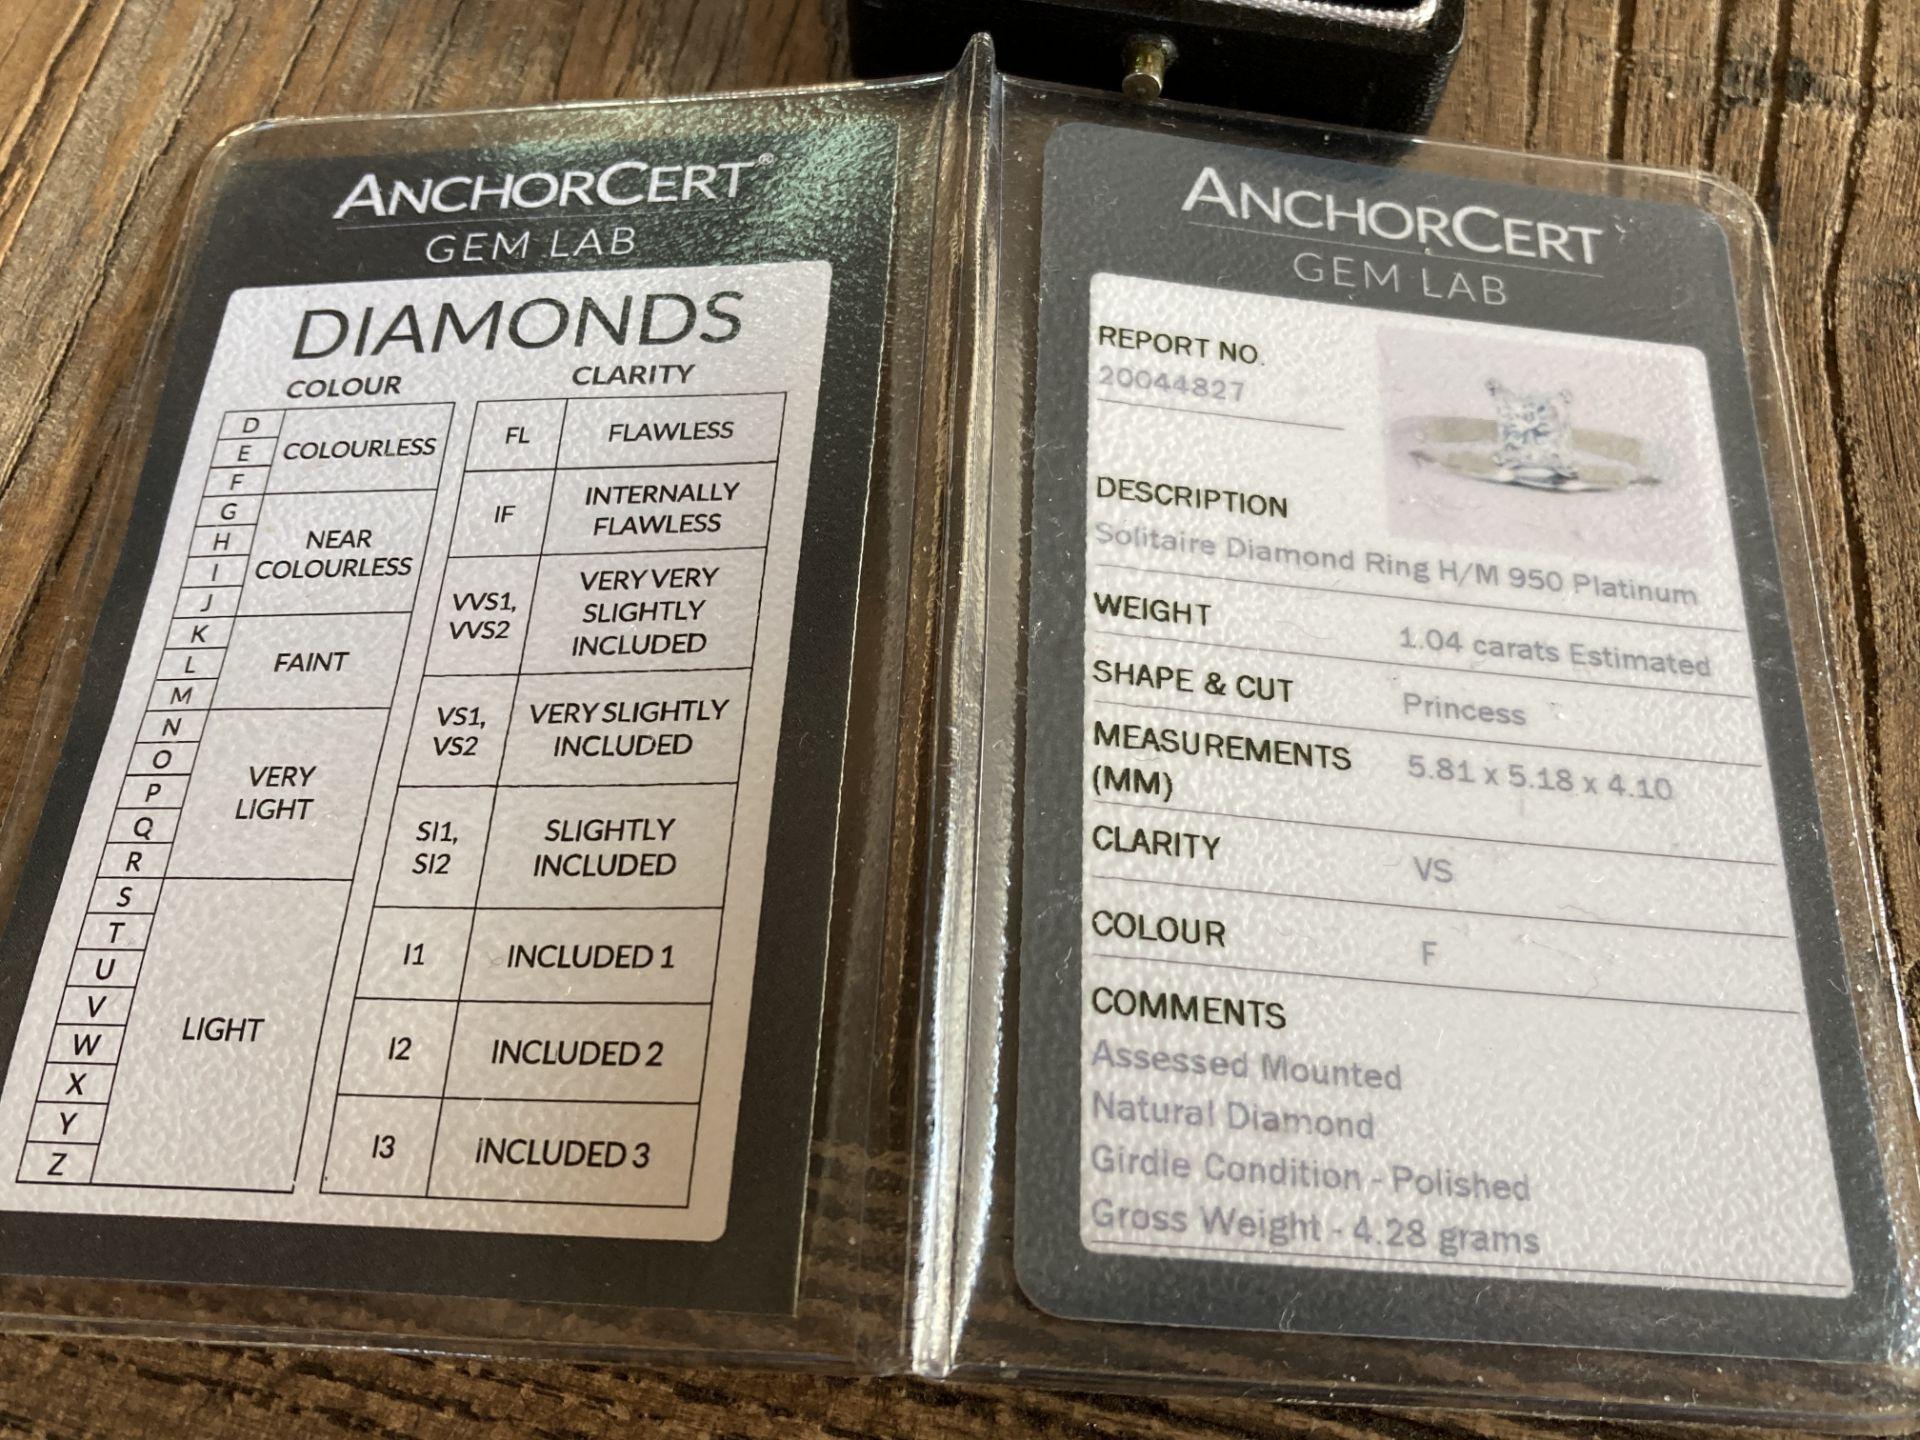 1.04CT (VS/F) PLATINUM PRINCESS CUT DIAMOND SOLITAIRE RING (CERTIFICATED) - Image 3 of 10